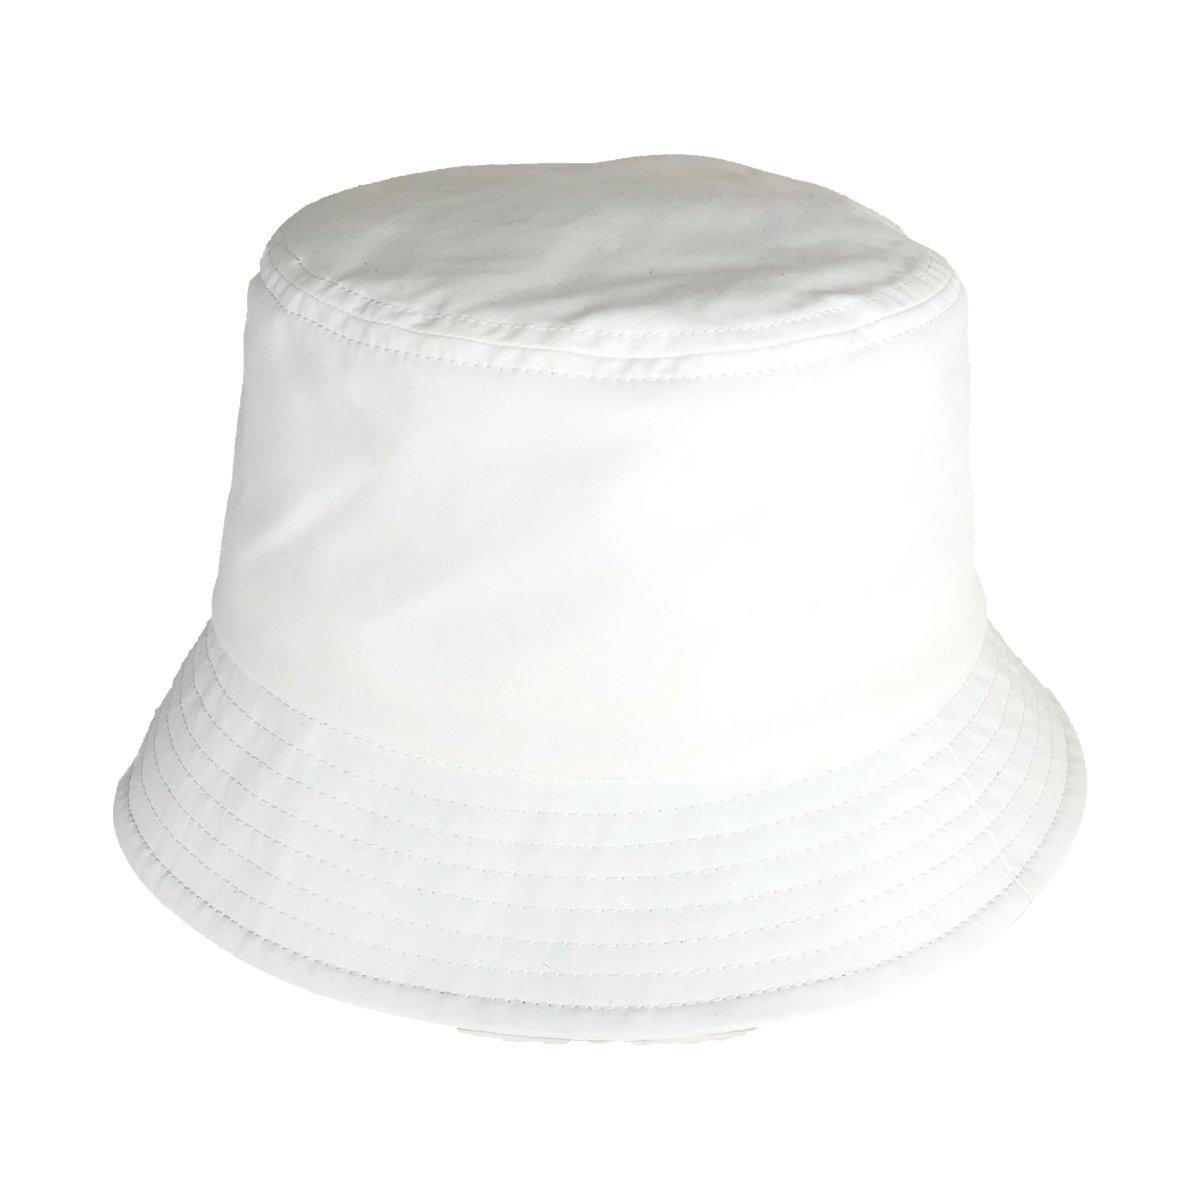 Genius BK Hat 詳細画像2